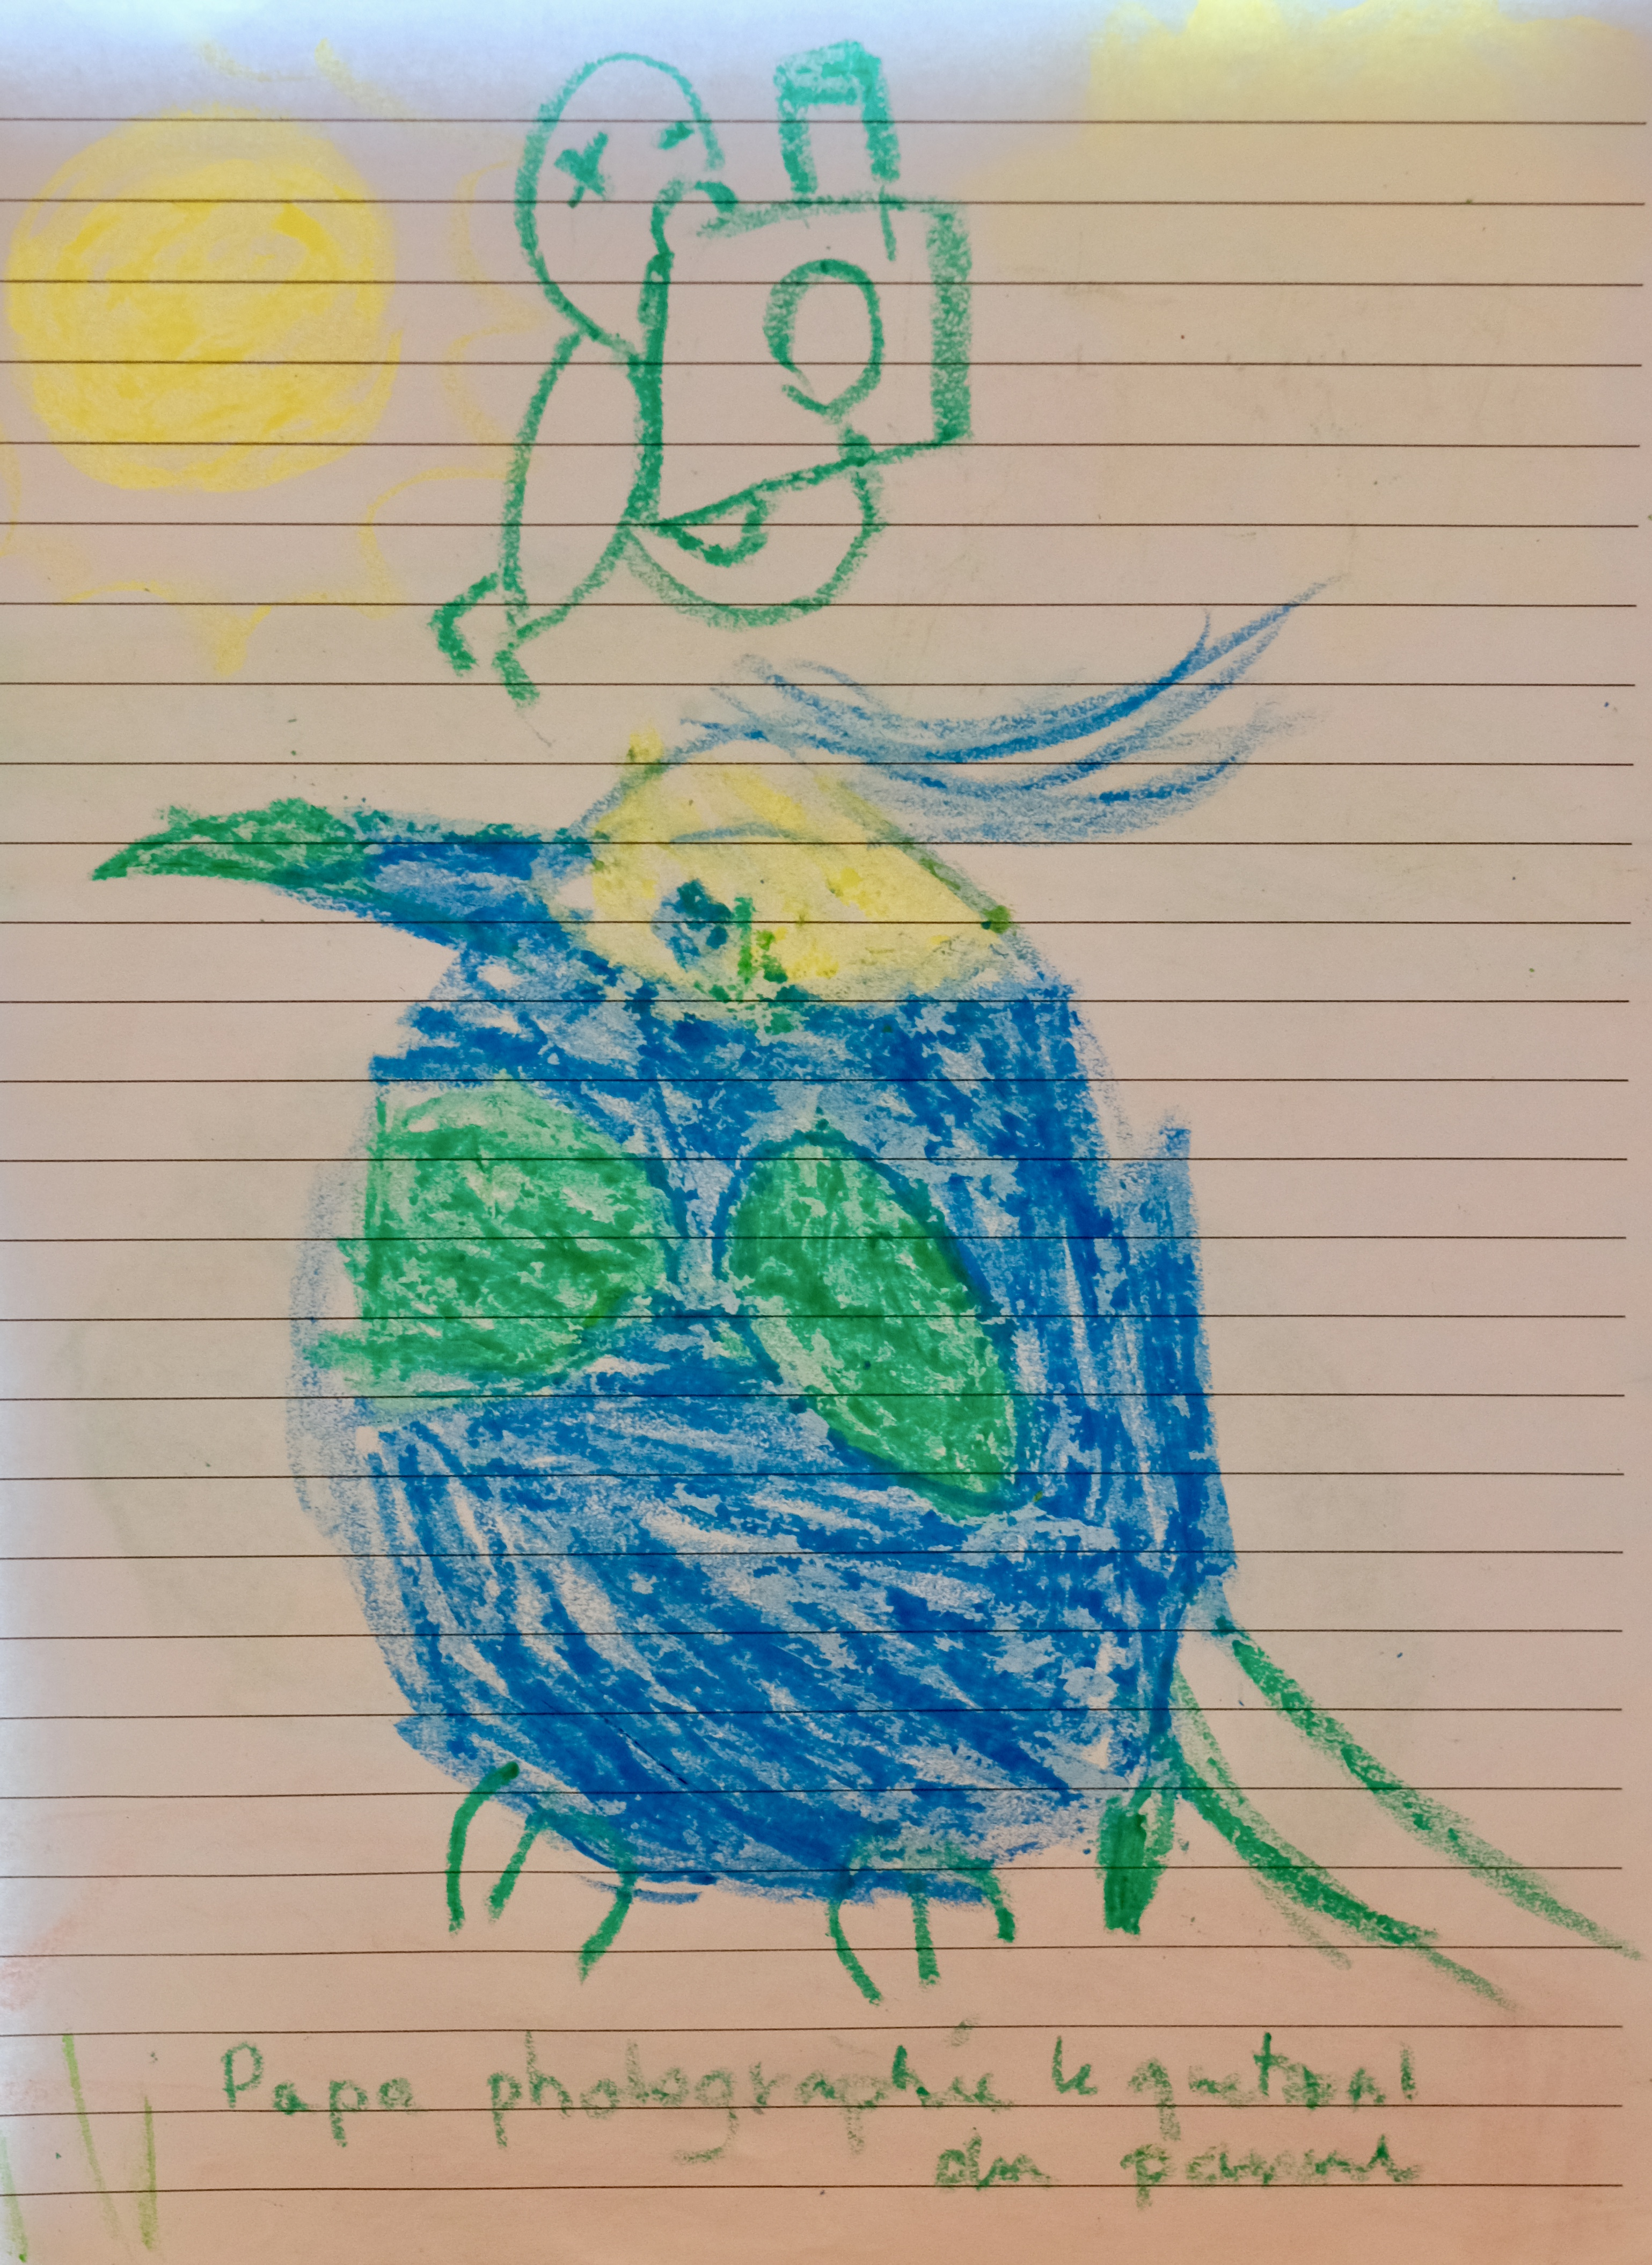 Costa Rica - Quetzal du pauvre